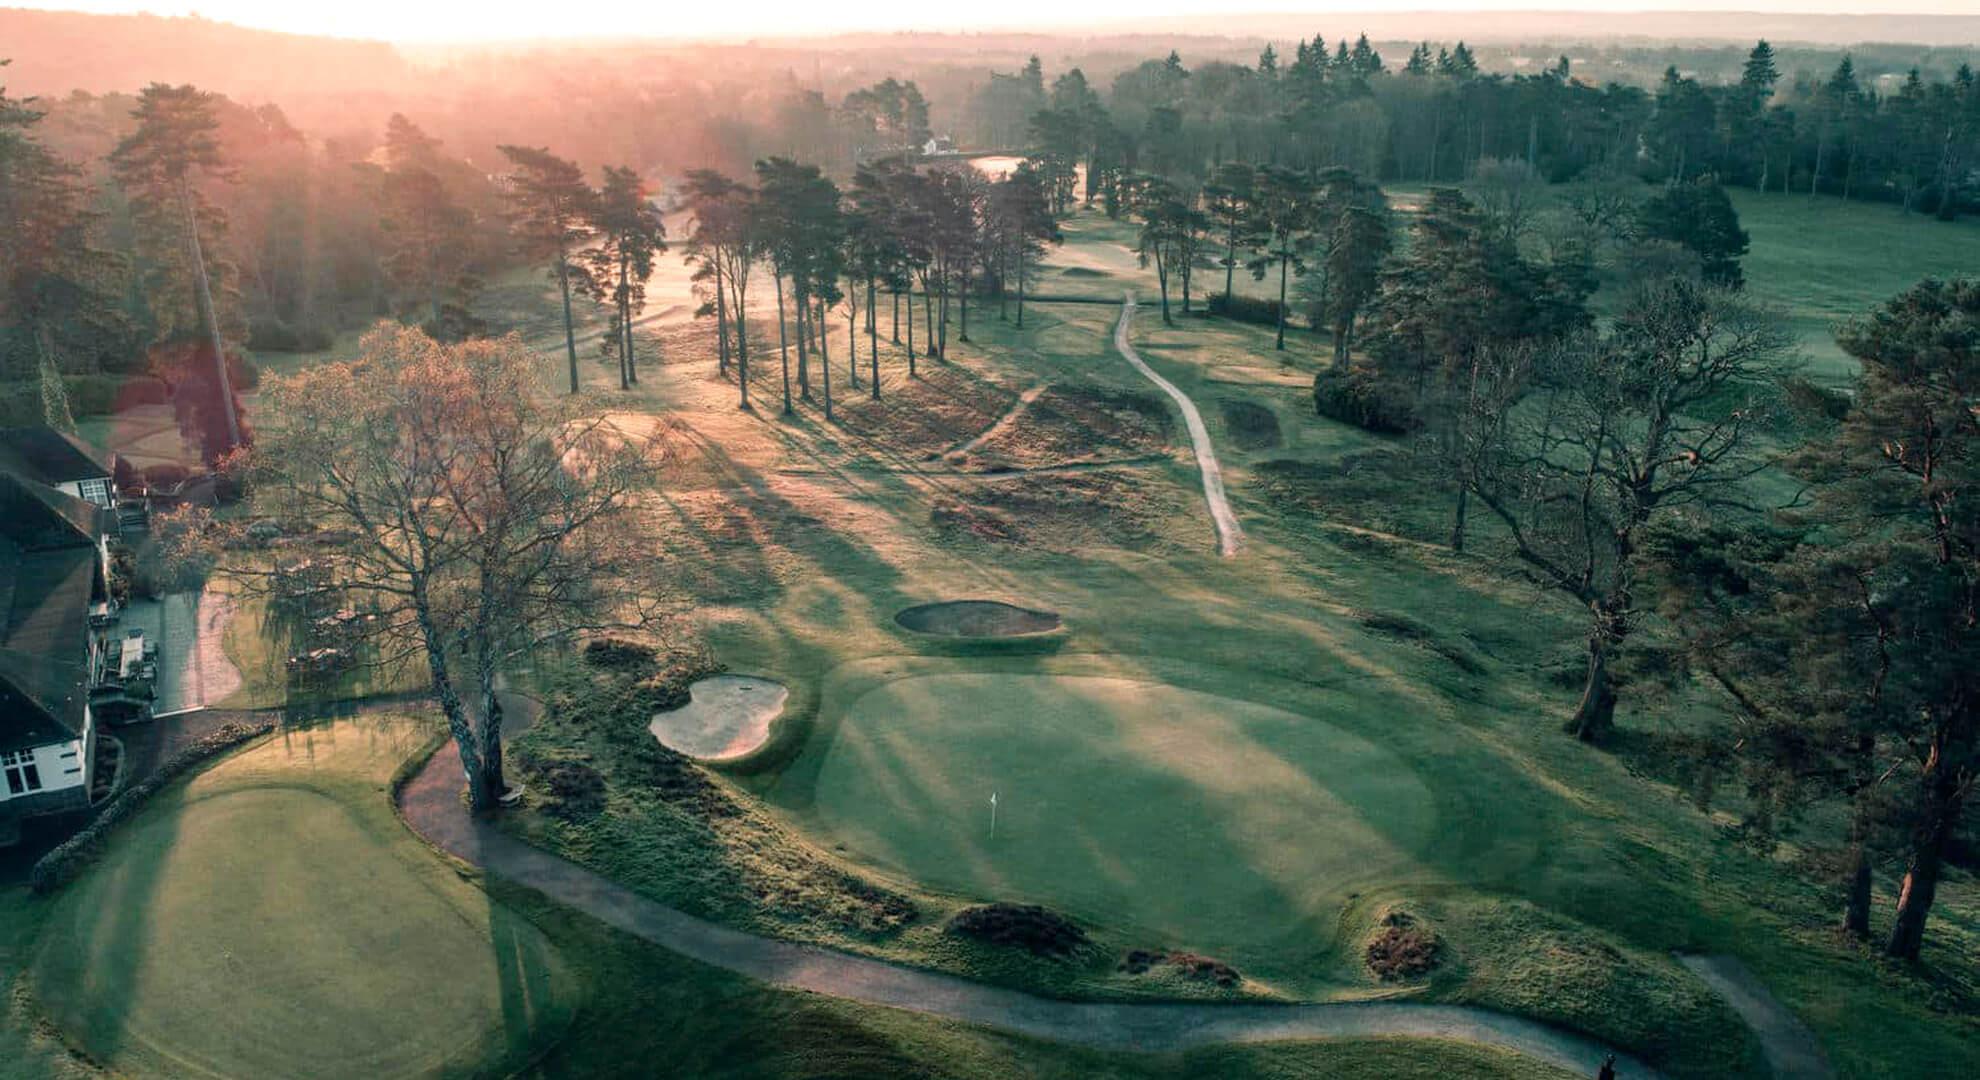 Worplesdon Golf Course, South East England